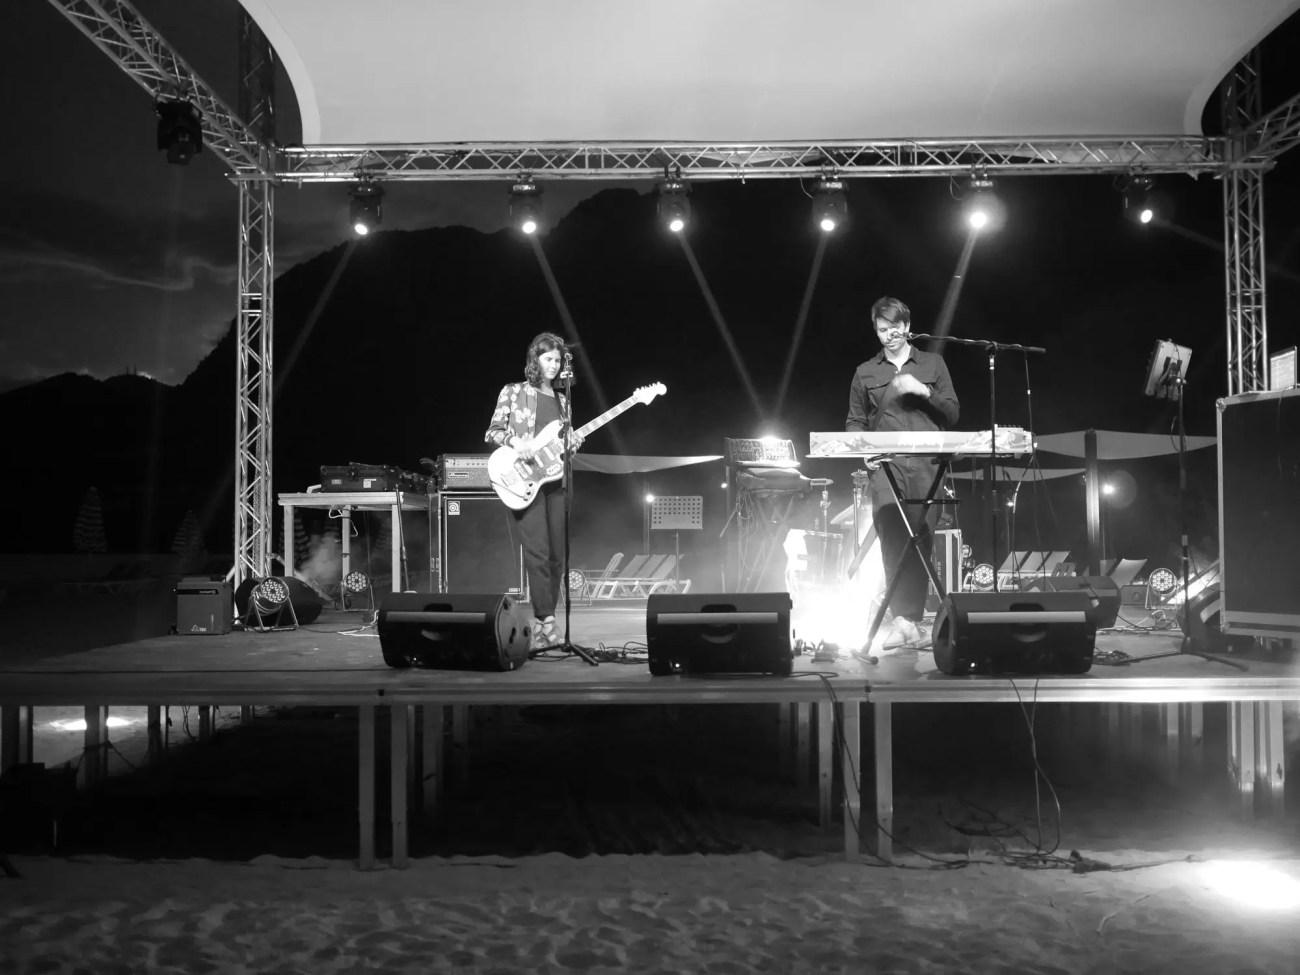 On The Beach Festival - Semaine musicale au Club Med 1